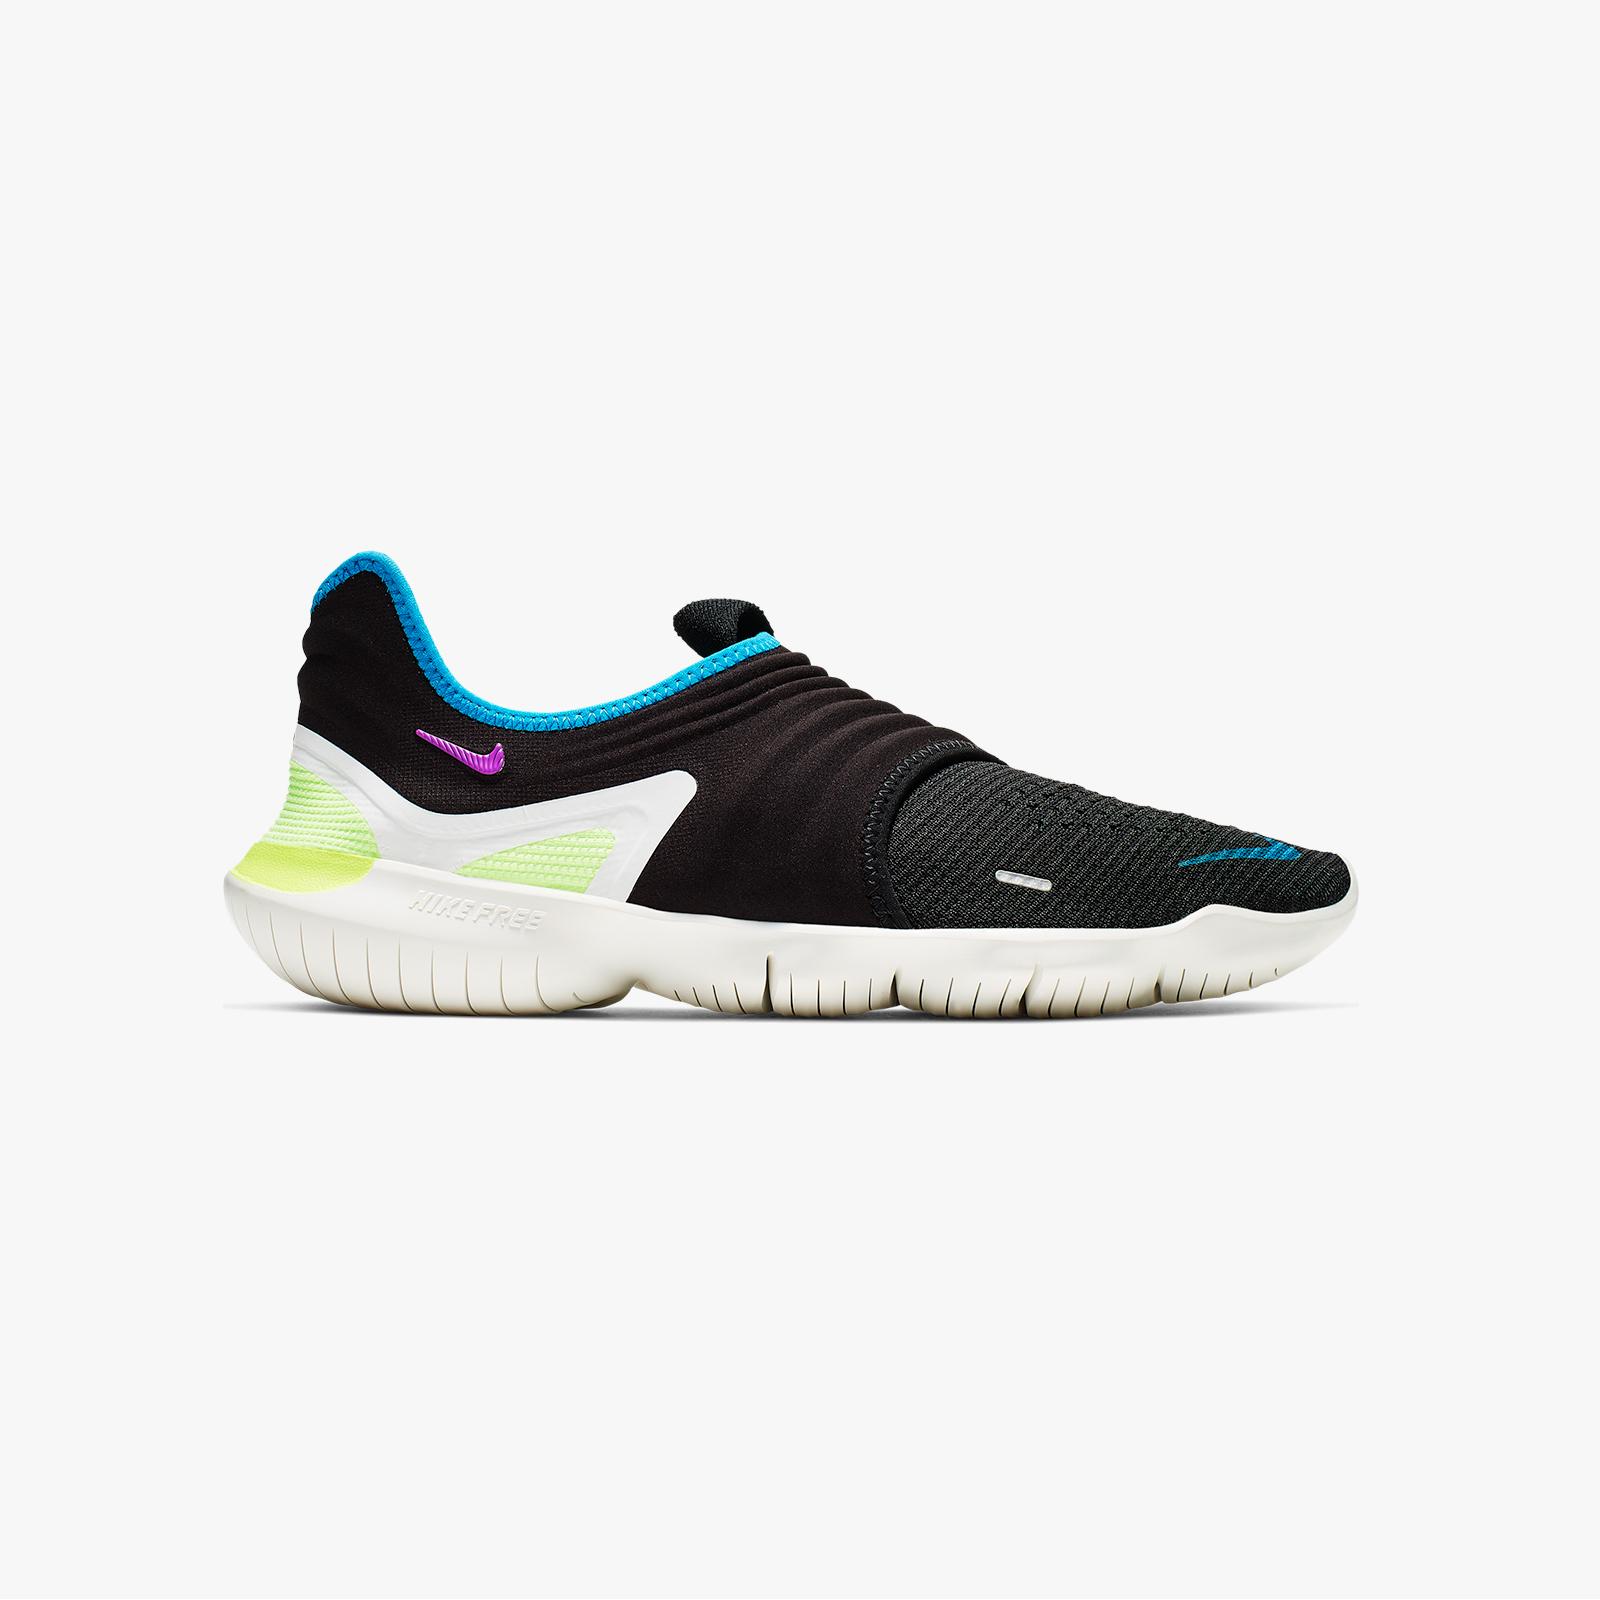 san francisco 72e34 6a5cc Nike Running Free RN Flyknit 3.0